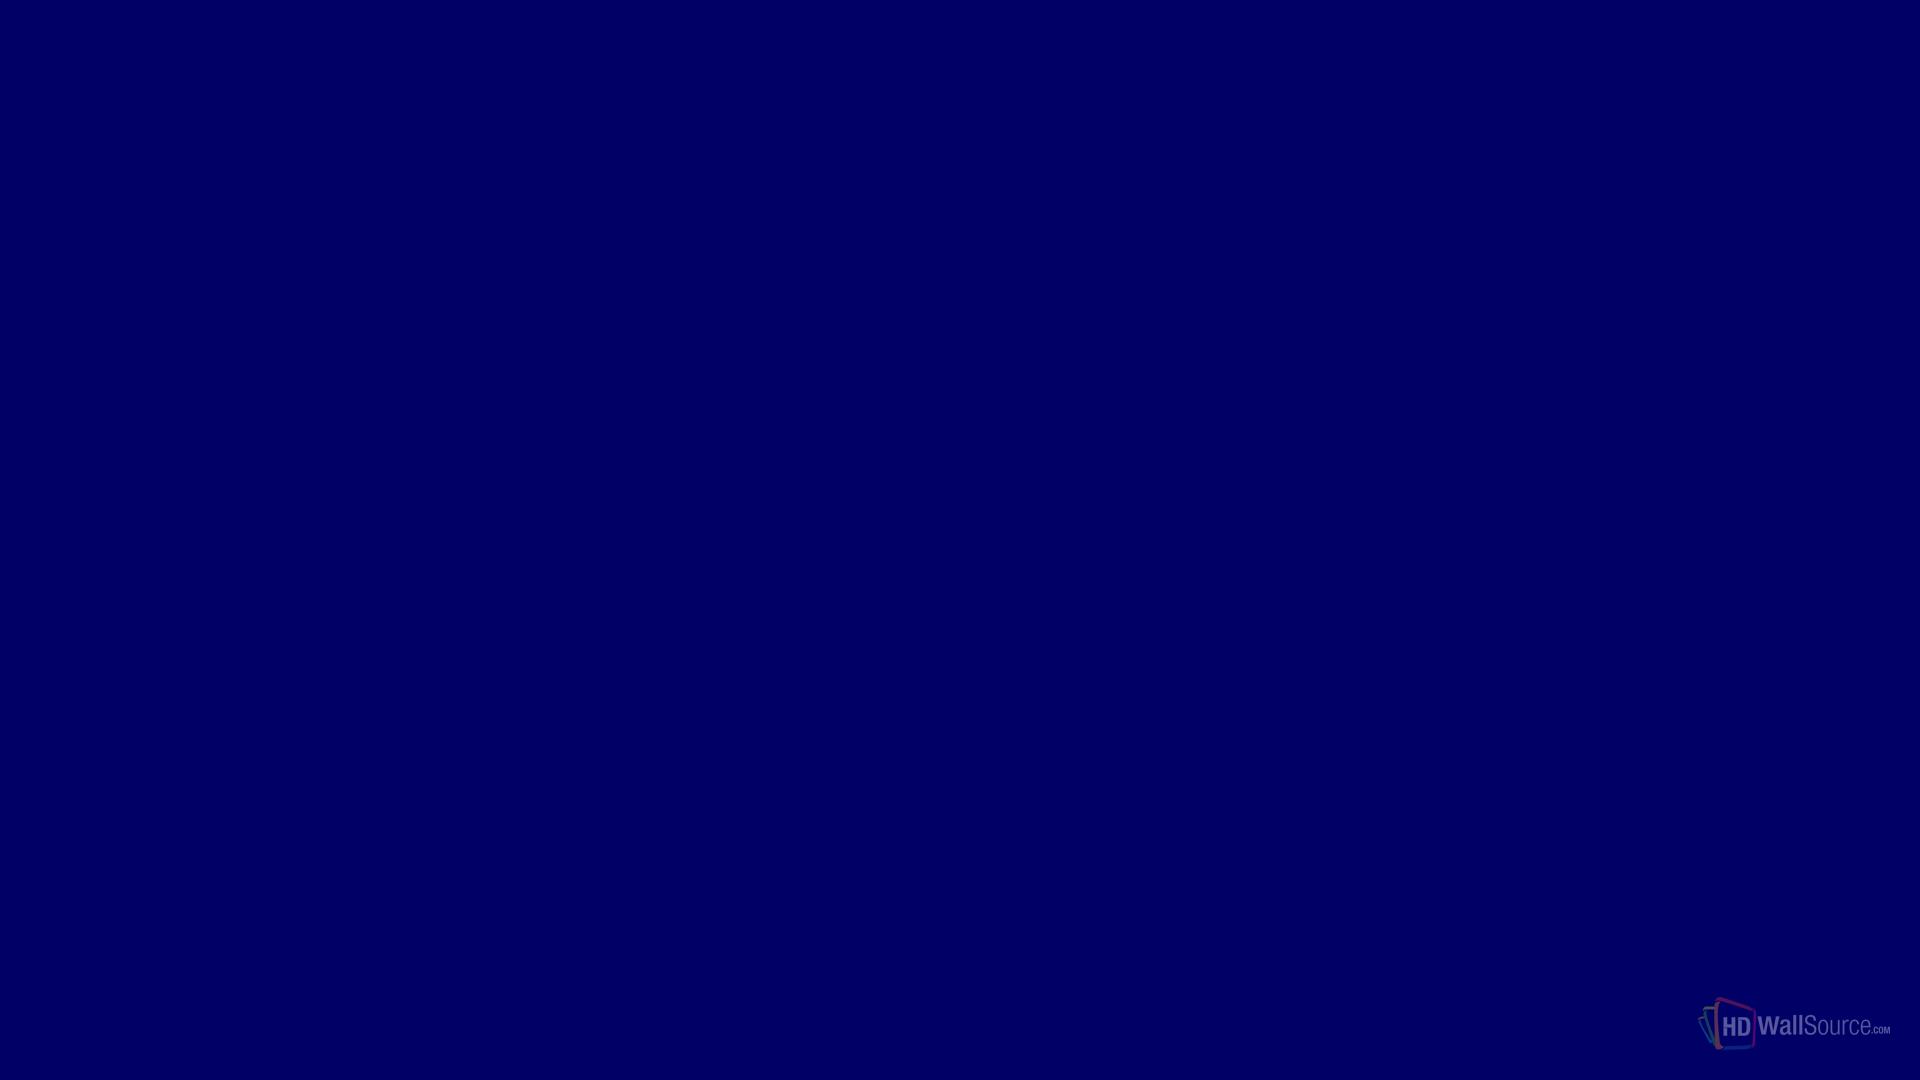 000066 wallpaper 71170